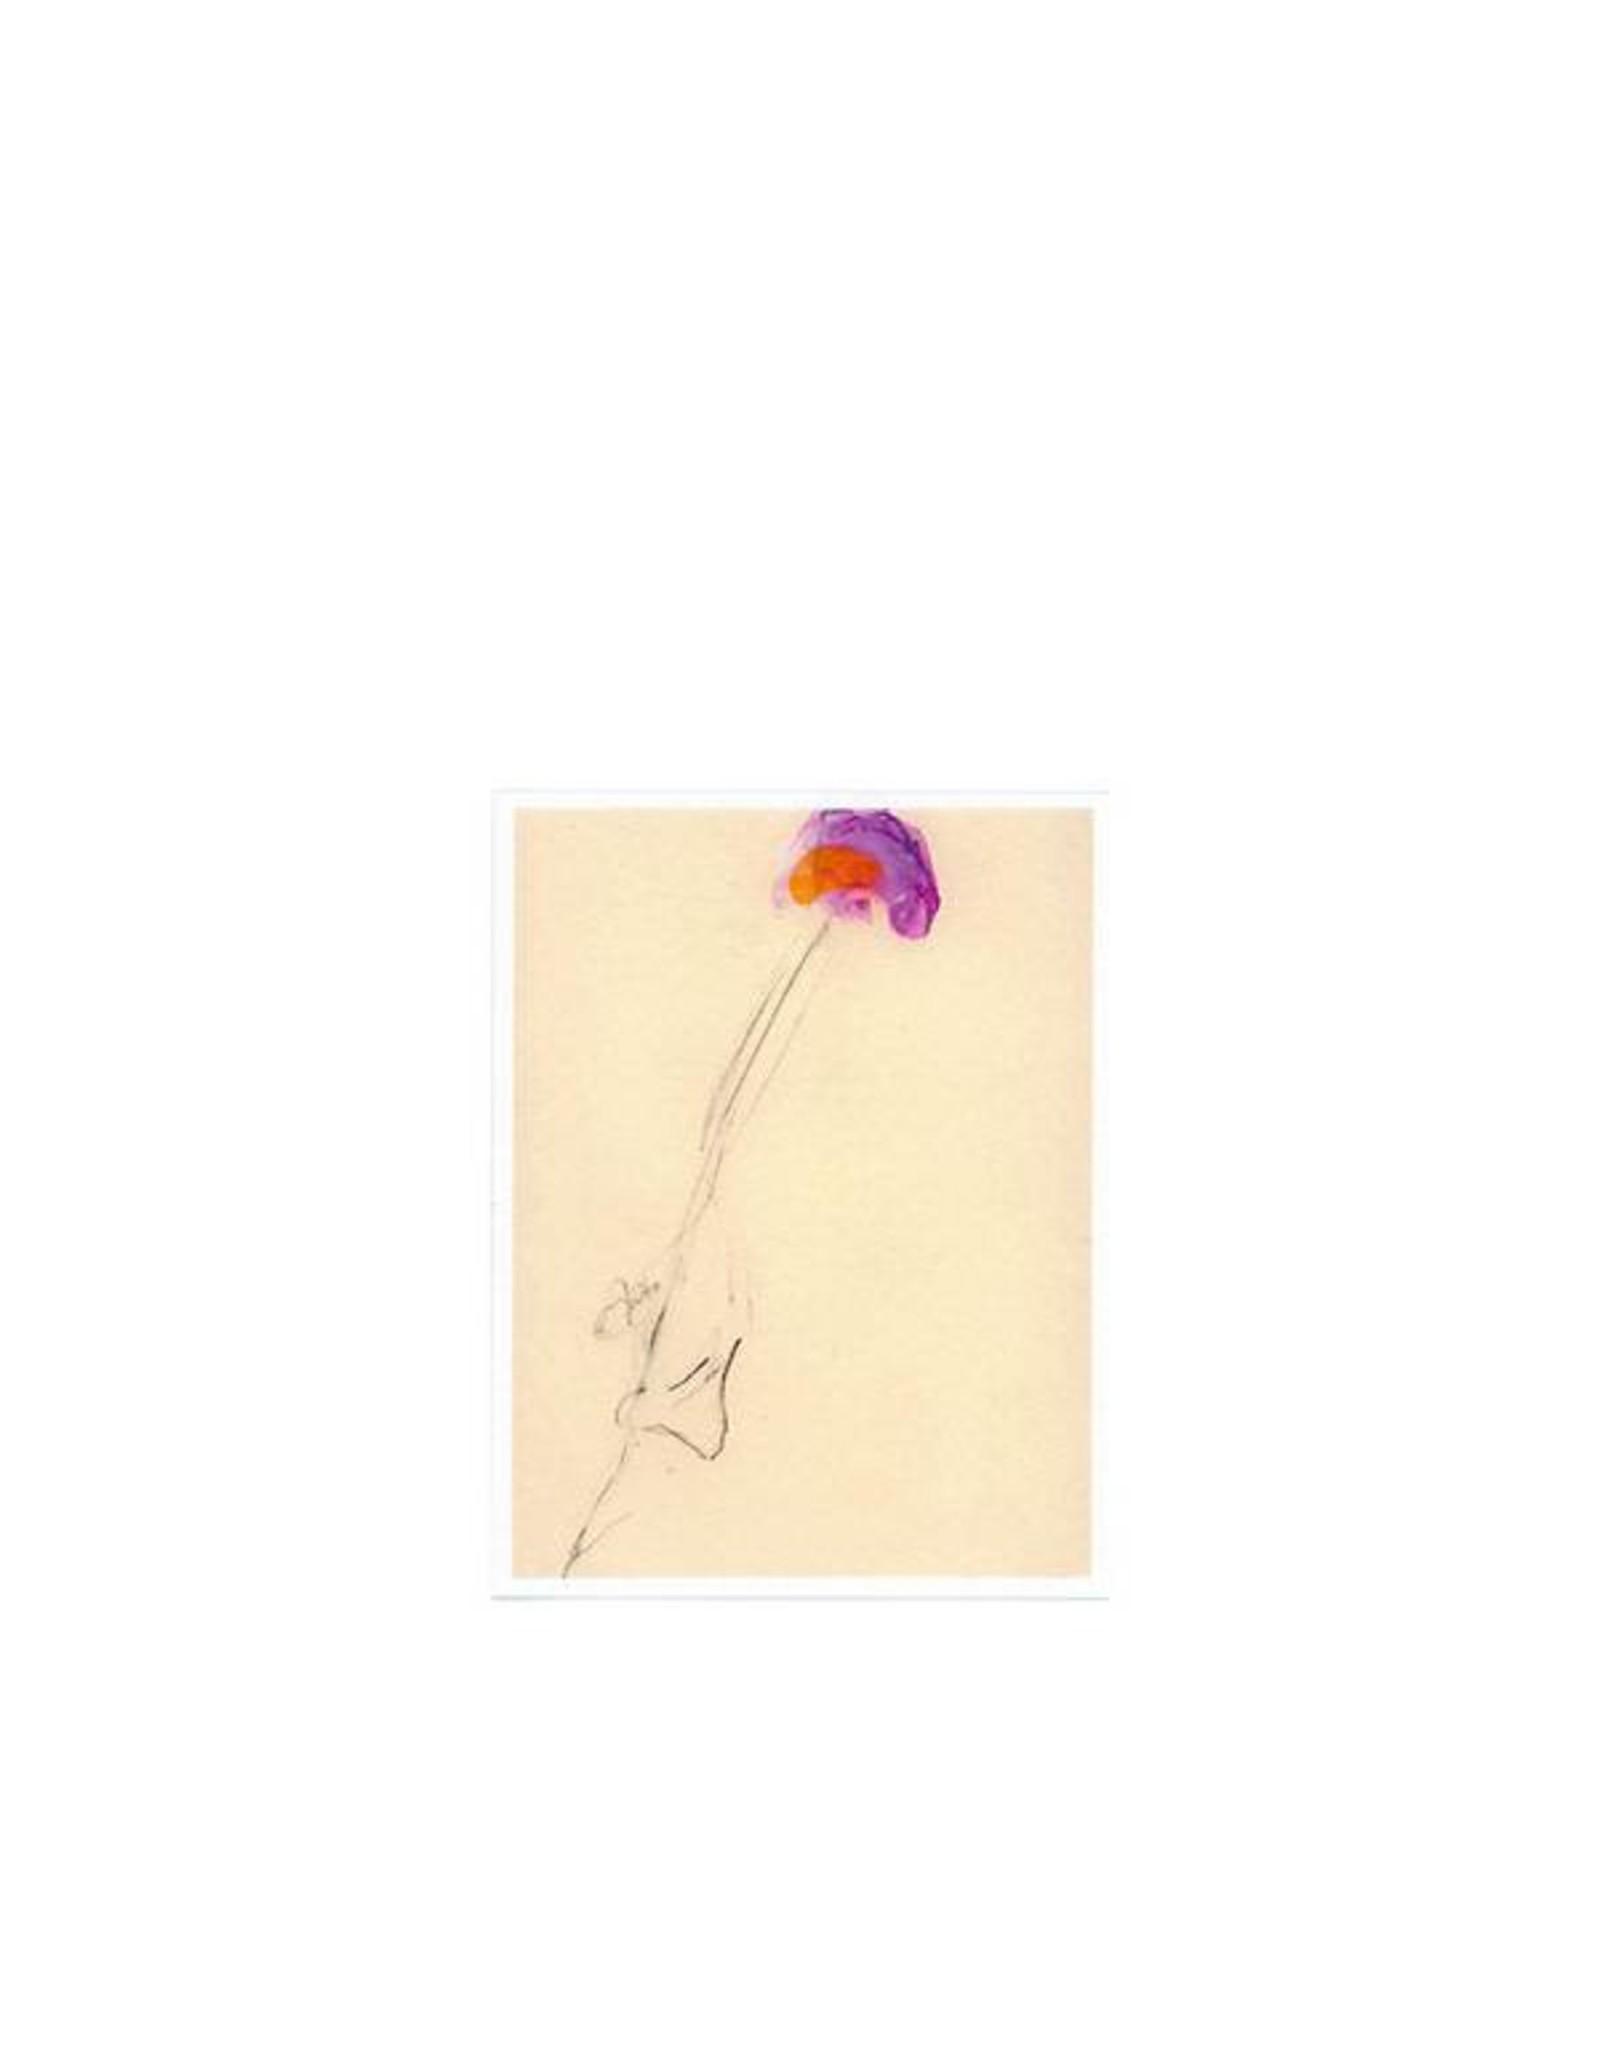 Blank Forms Connors, Loren: Unaccompanied Acoustic Guitar Improvisations Vol 10 LP